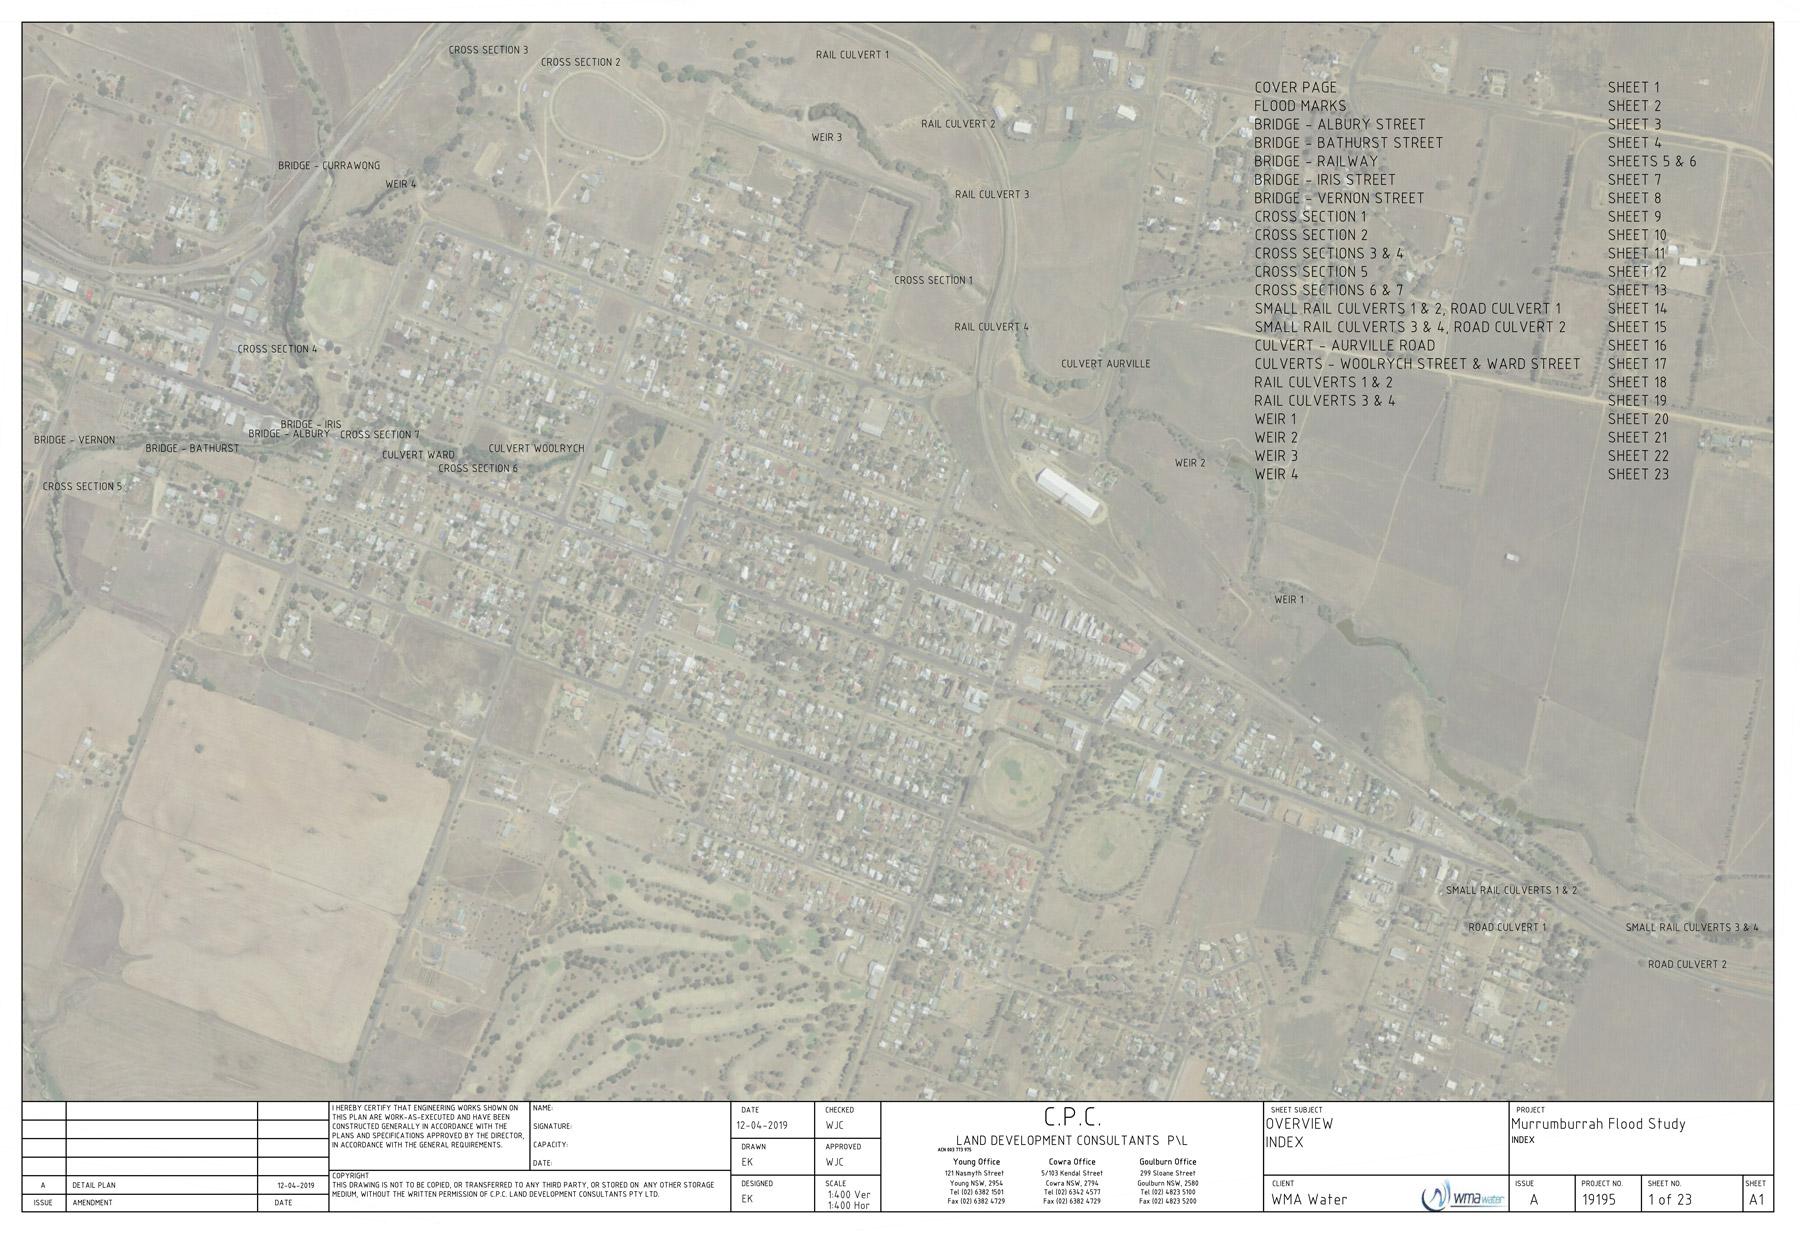 Murrumburrah Flood Study Report DRAFT